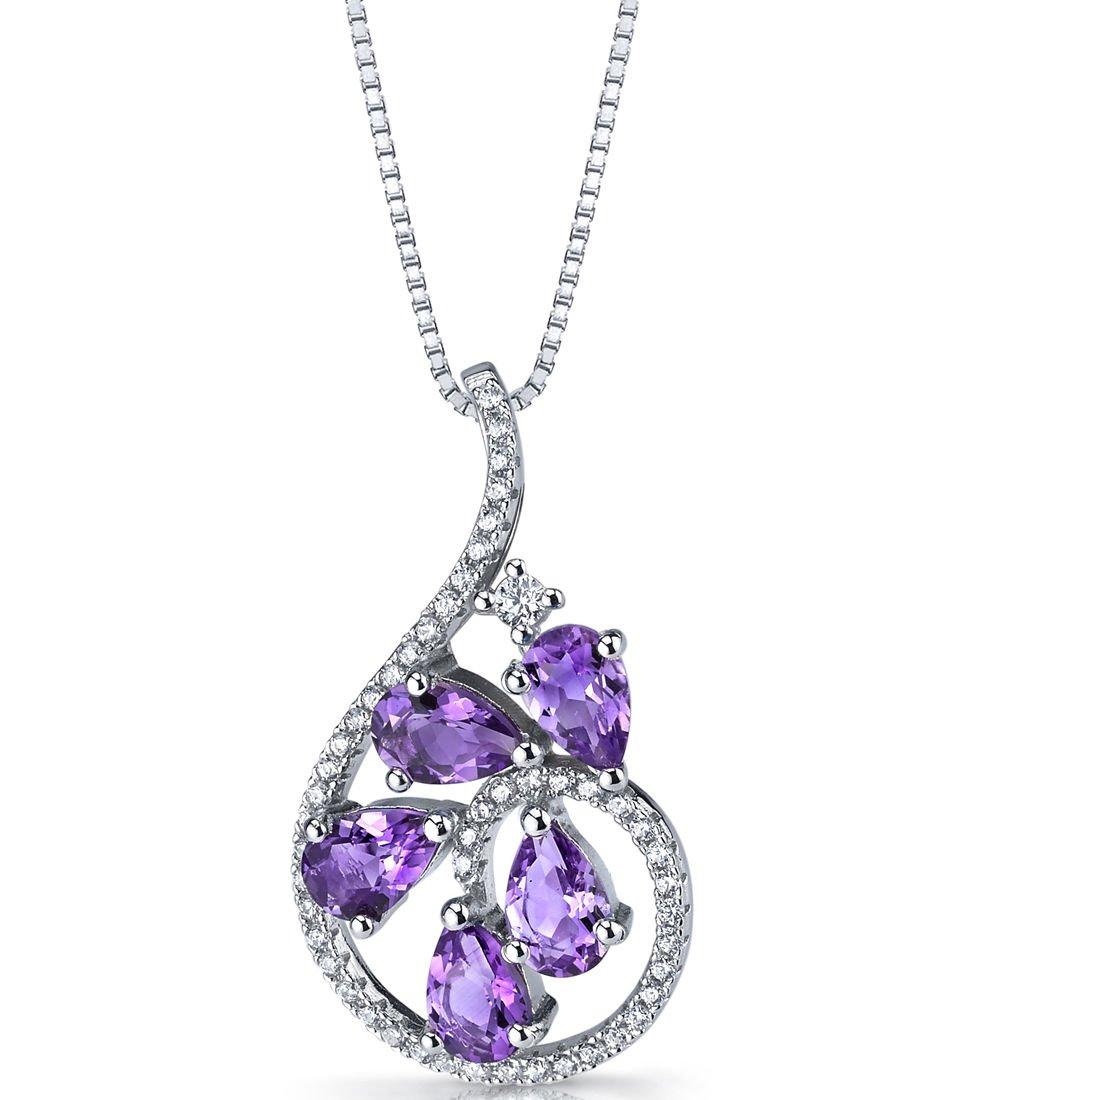 Women's Sterling Silver Amethyst Dewdrop Pendant Necklace